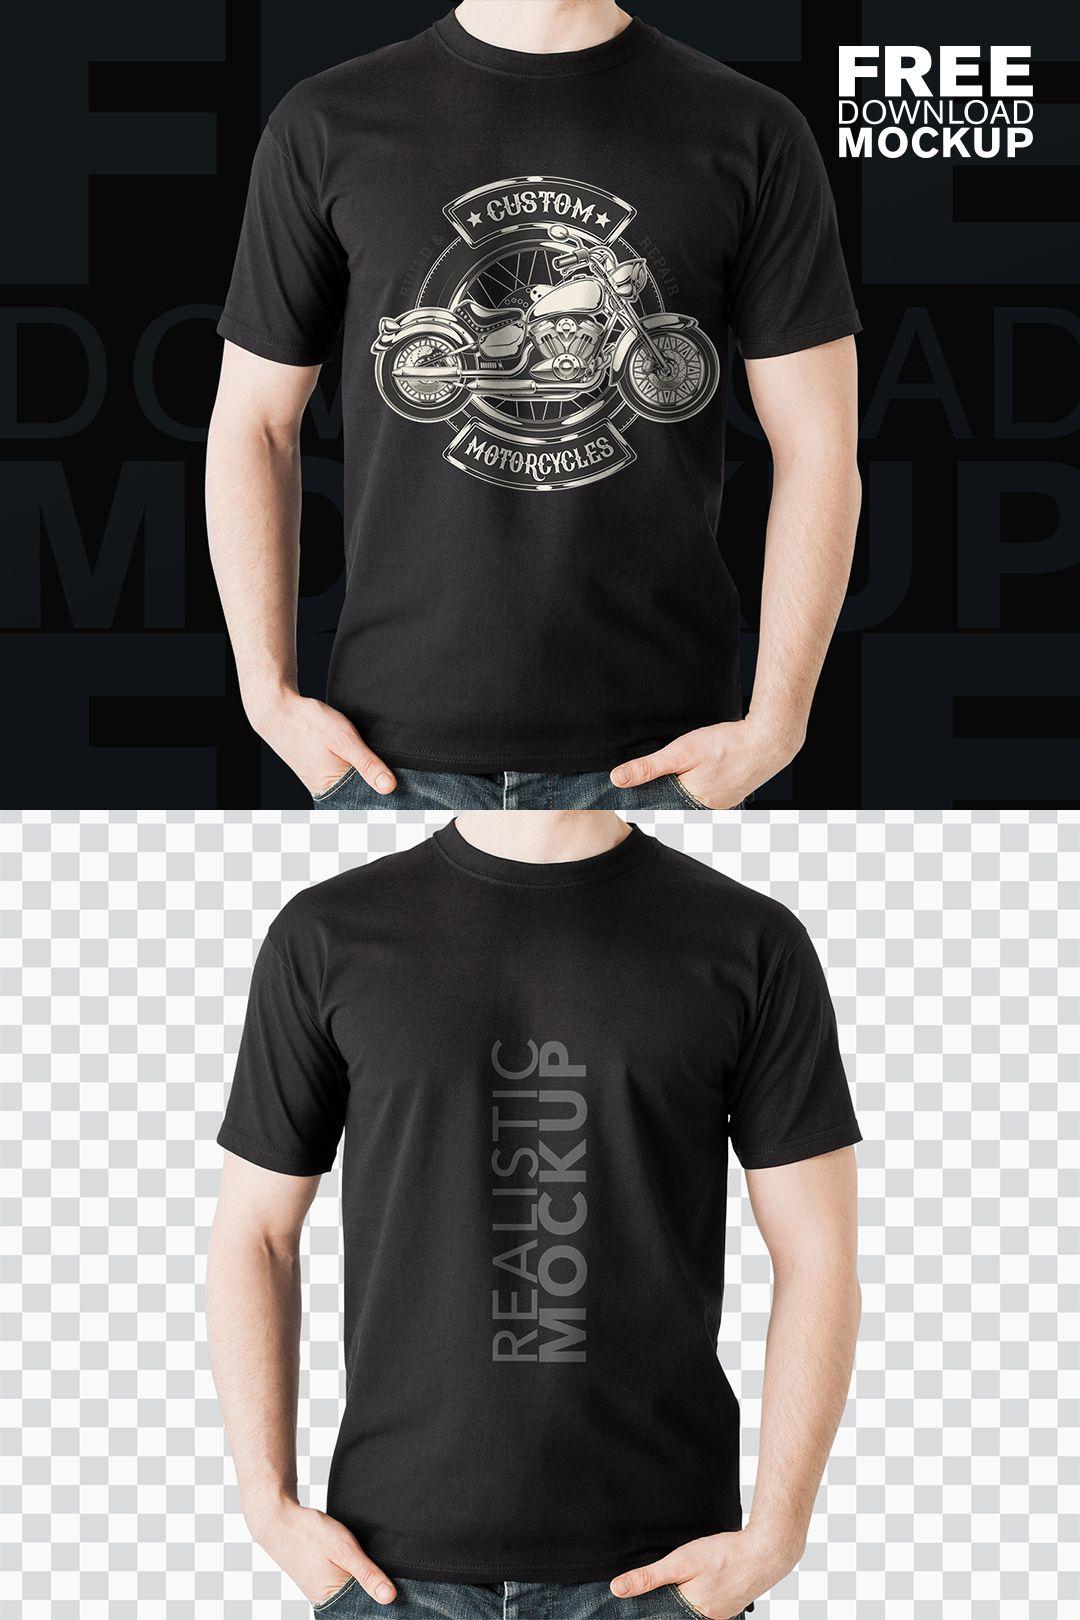 Download Black Realistic T Shirt Free Psd Mockup T Shirt Free Shirts Shirts